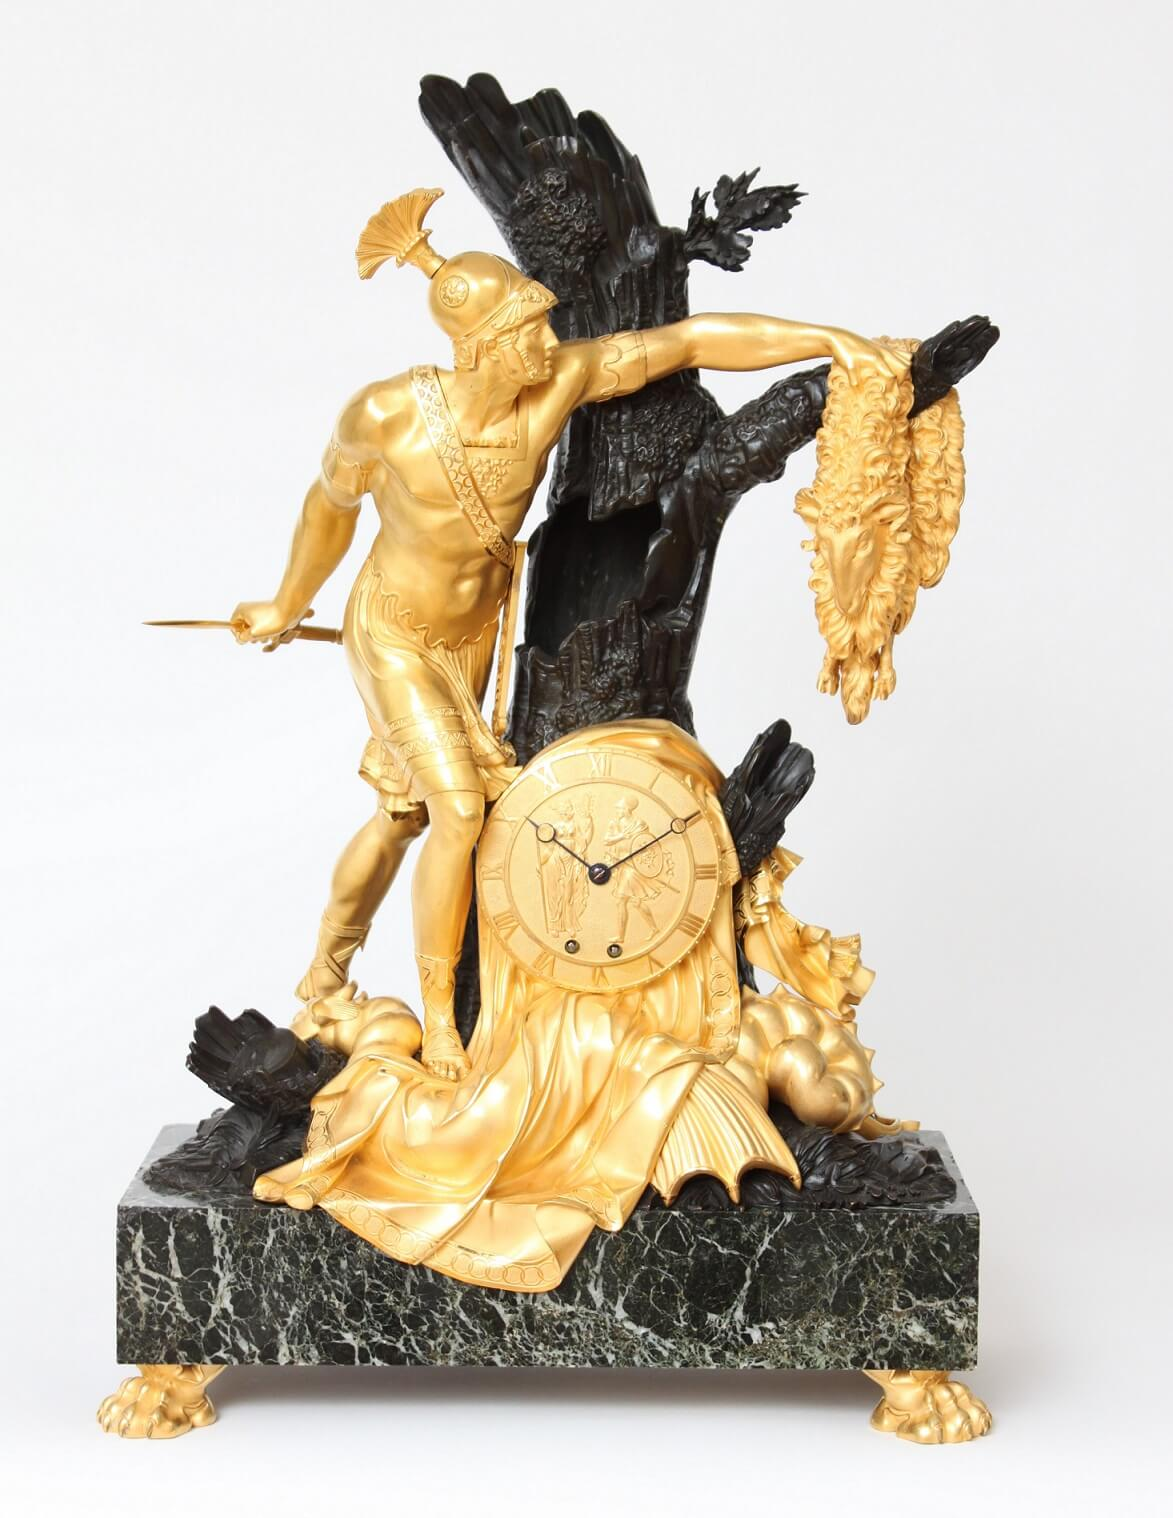 antique clock-Empire-French-ormolu-sculptural-striking-Jason-golden fleece-lesieur